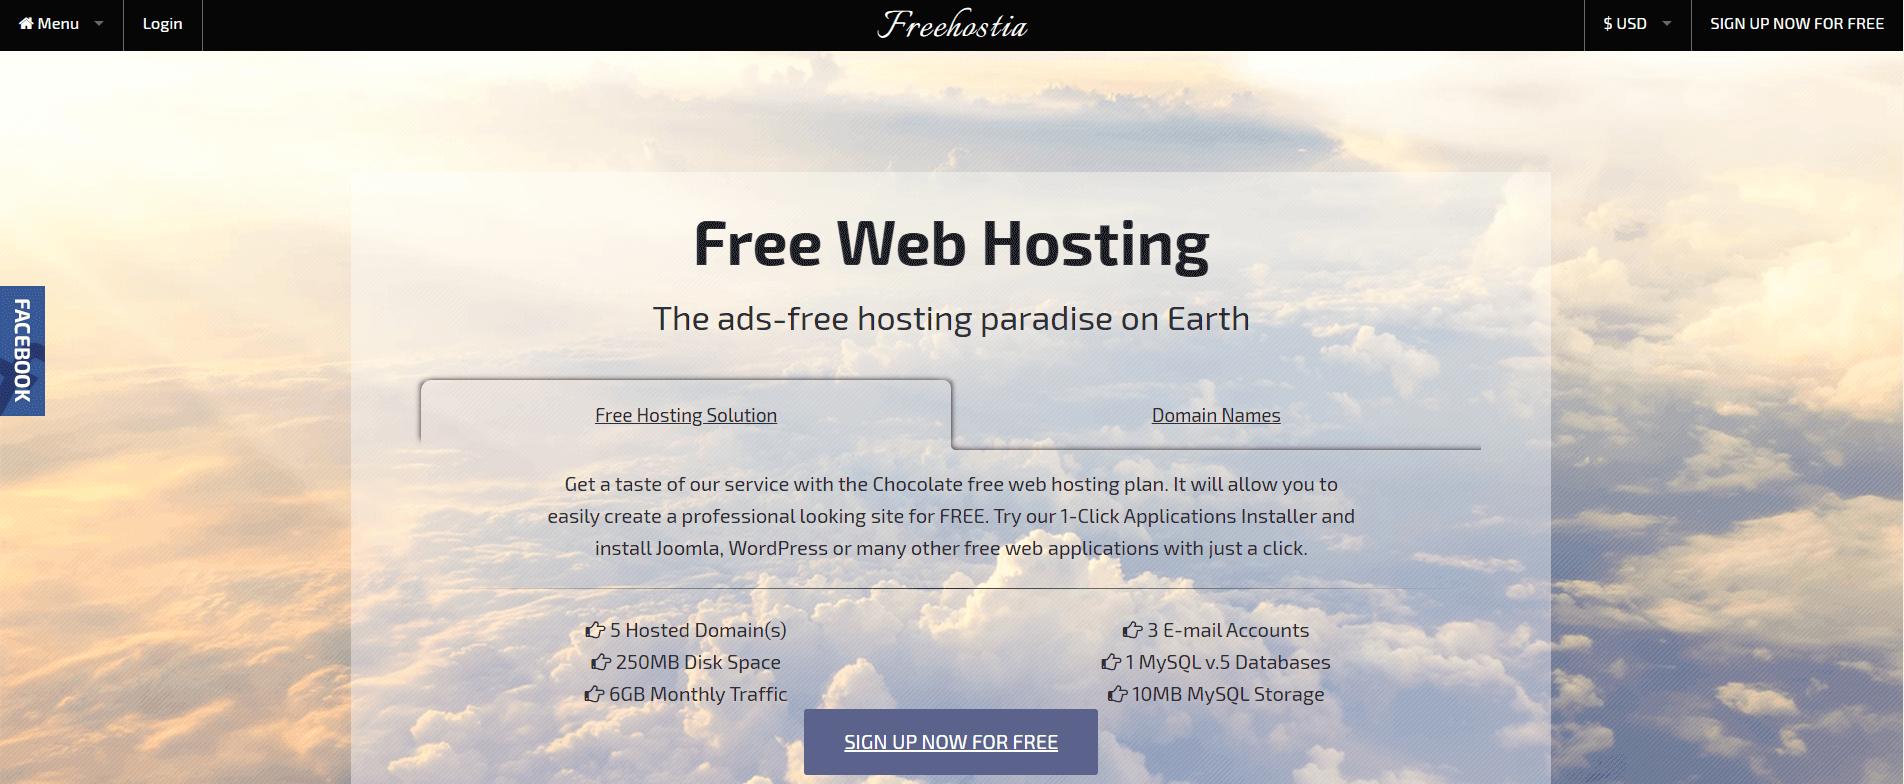 Free web hosting from Freehostia